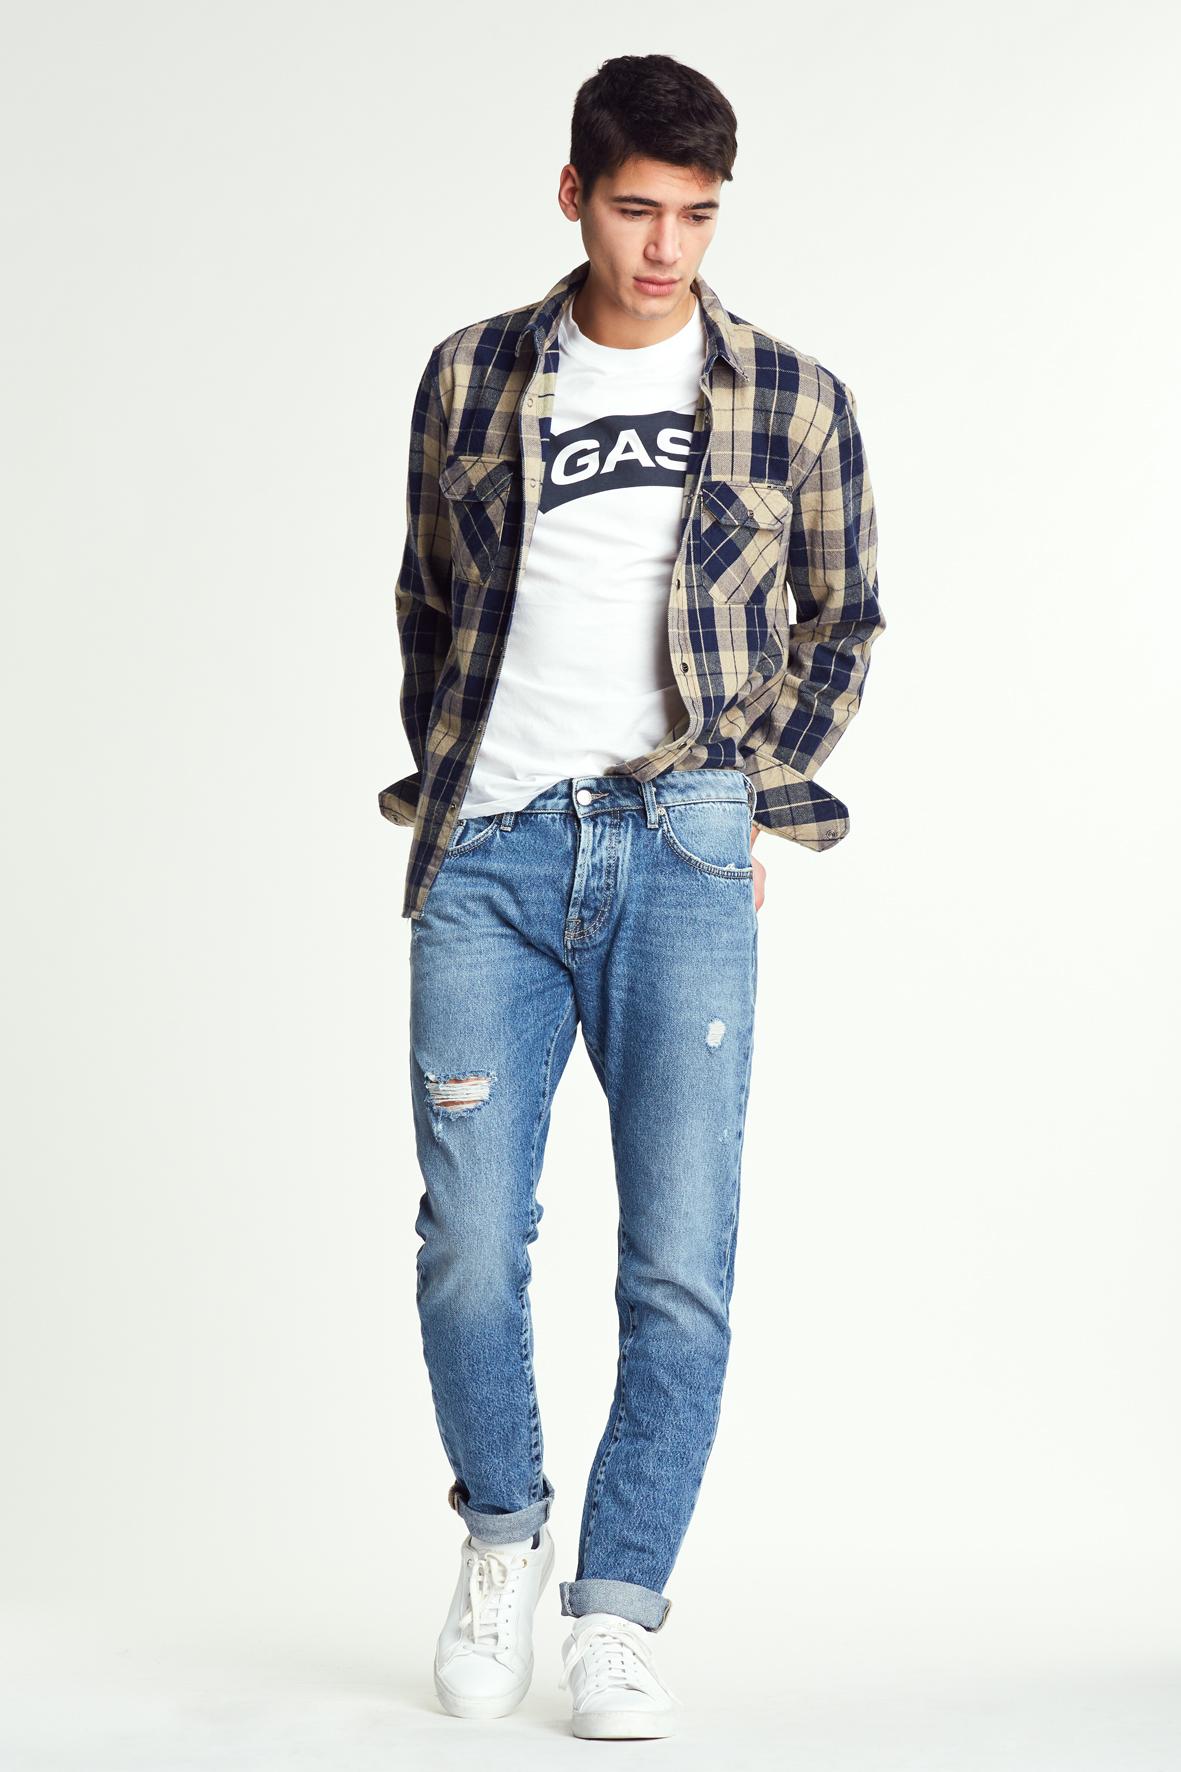 Pitti Uomo Gennaio 2019 Gas Jeans